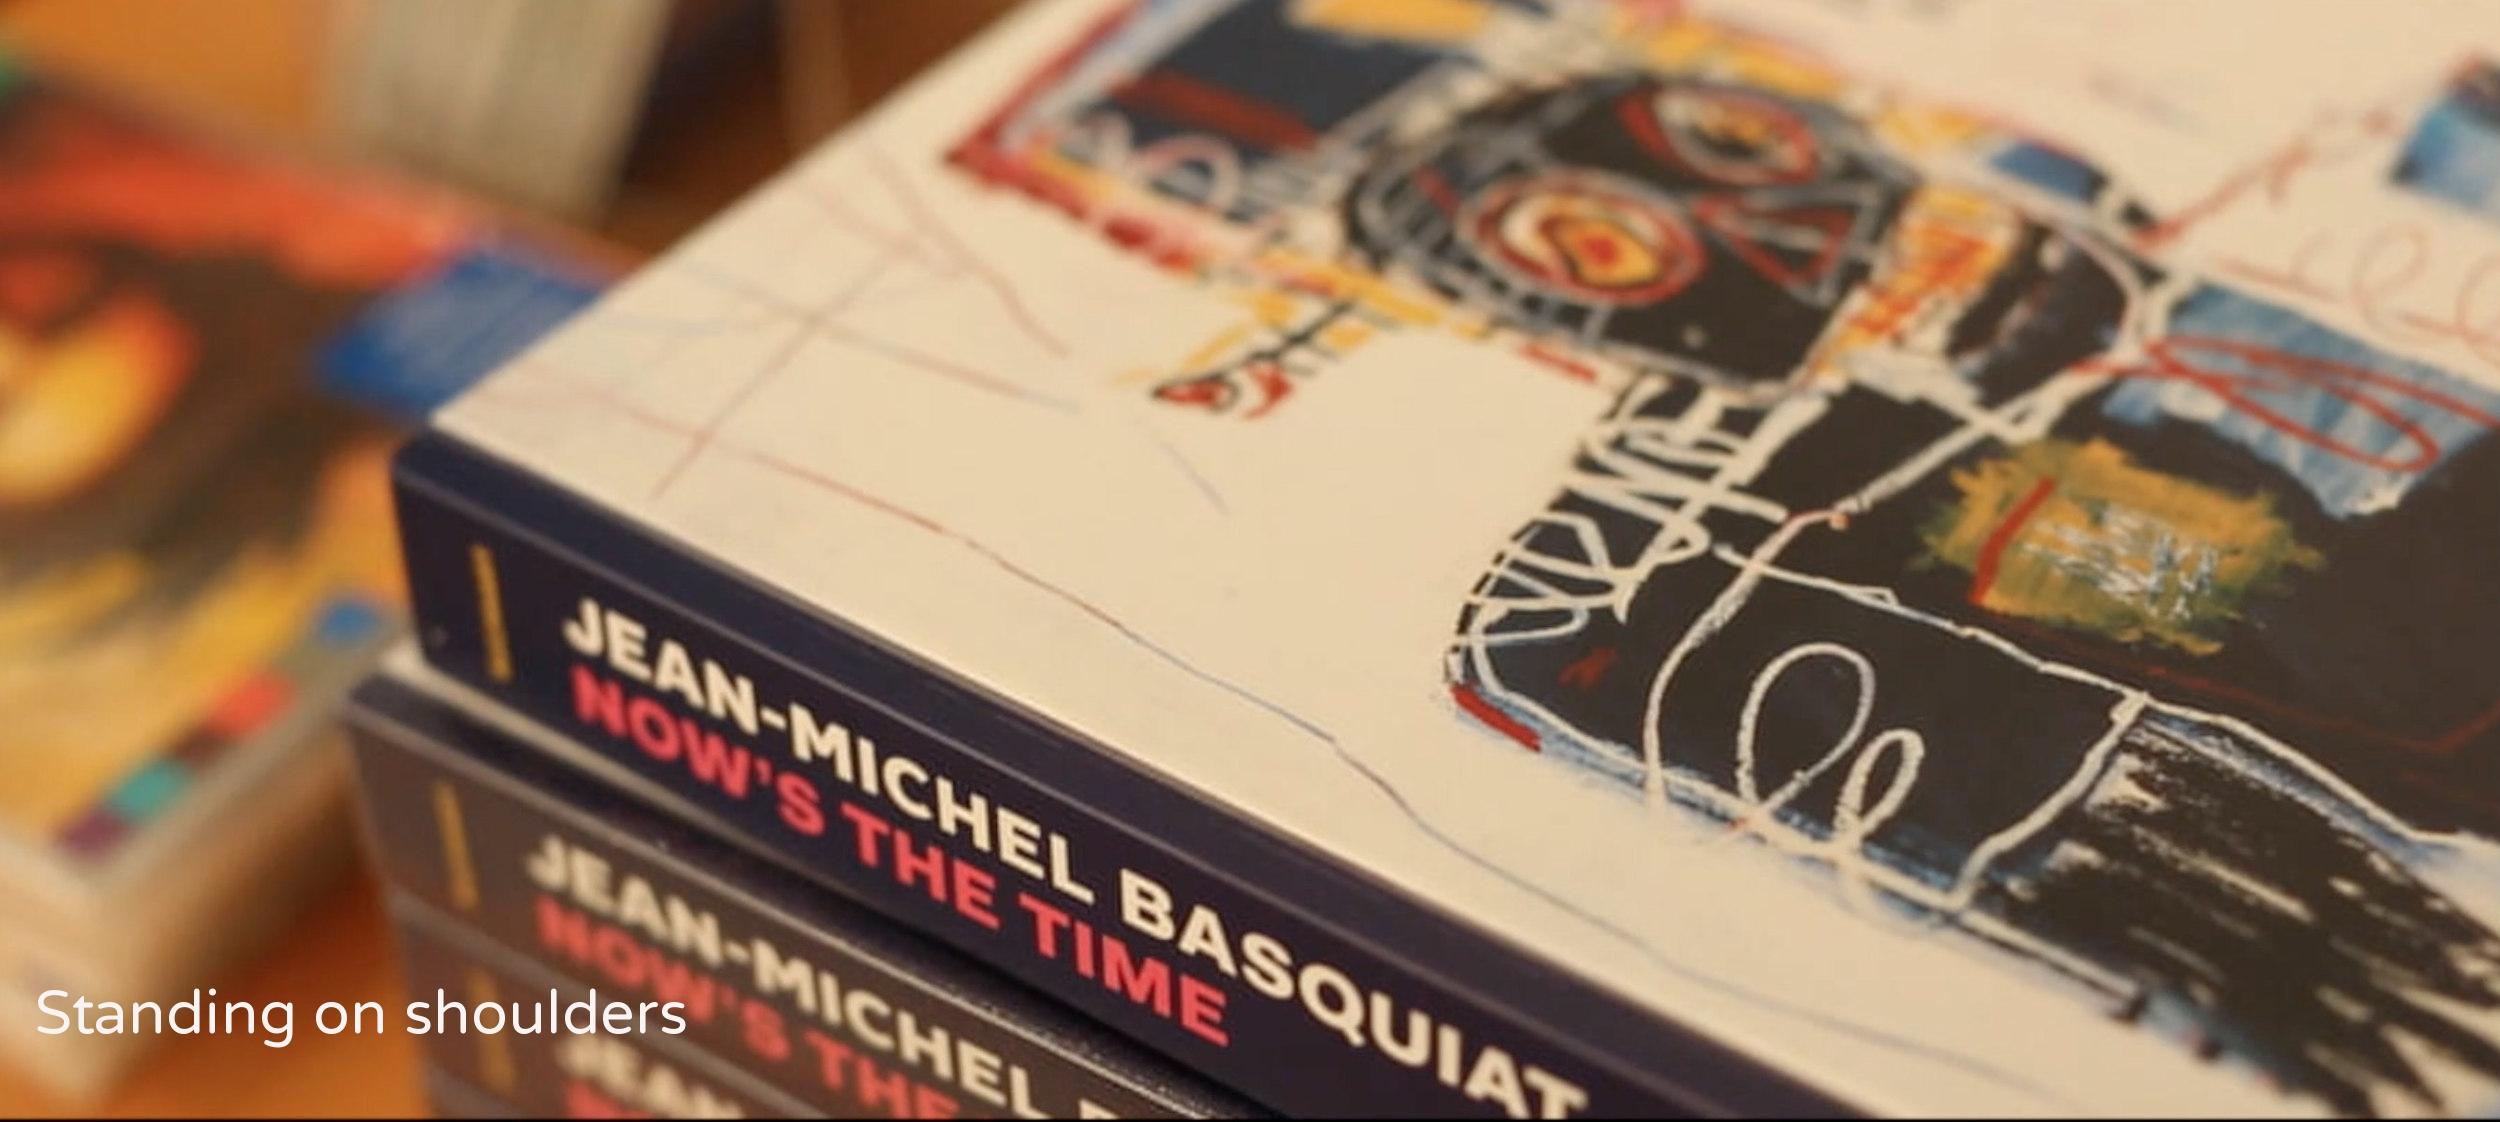 Jean-Michel Basquiat.jpg